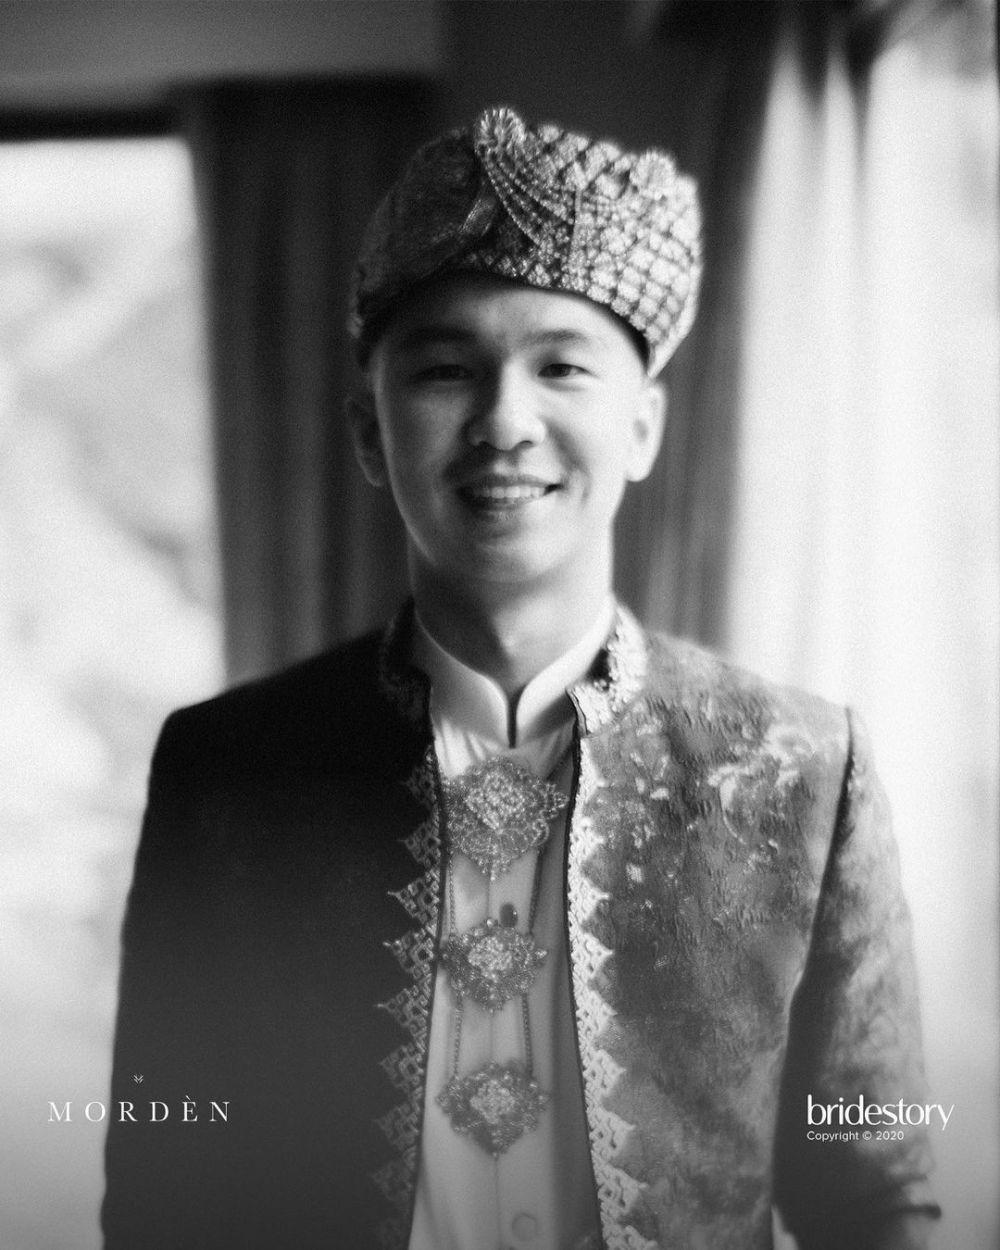 Nikita Willy Menikah, 10 Potret Megah Nikahan Niki dan Indra Priawan